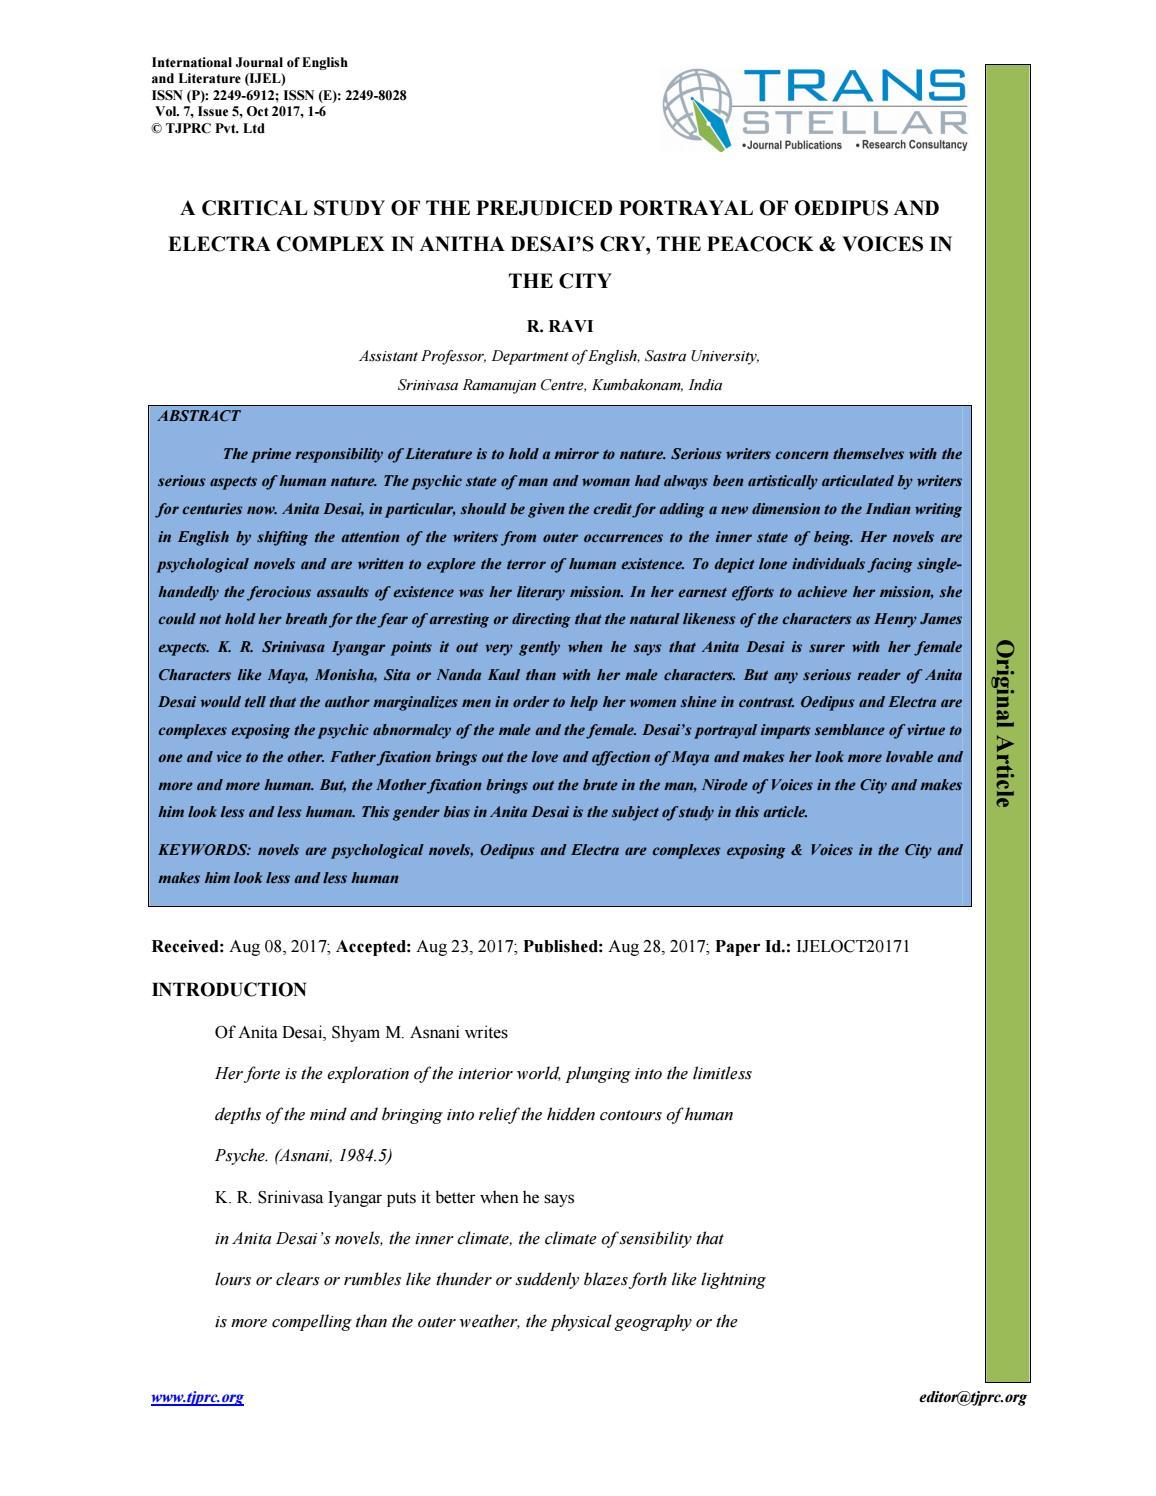 1 ijeloct20171 by Transtellar Publications - issuu